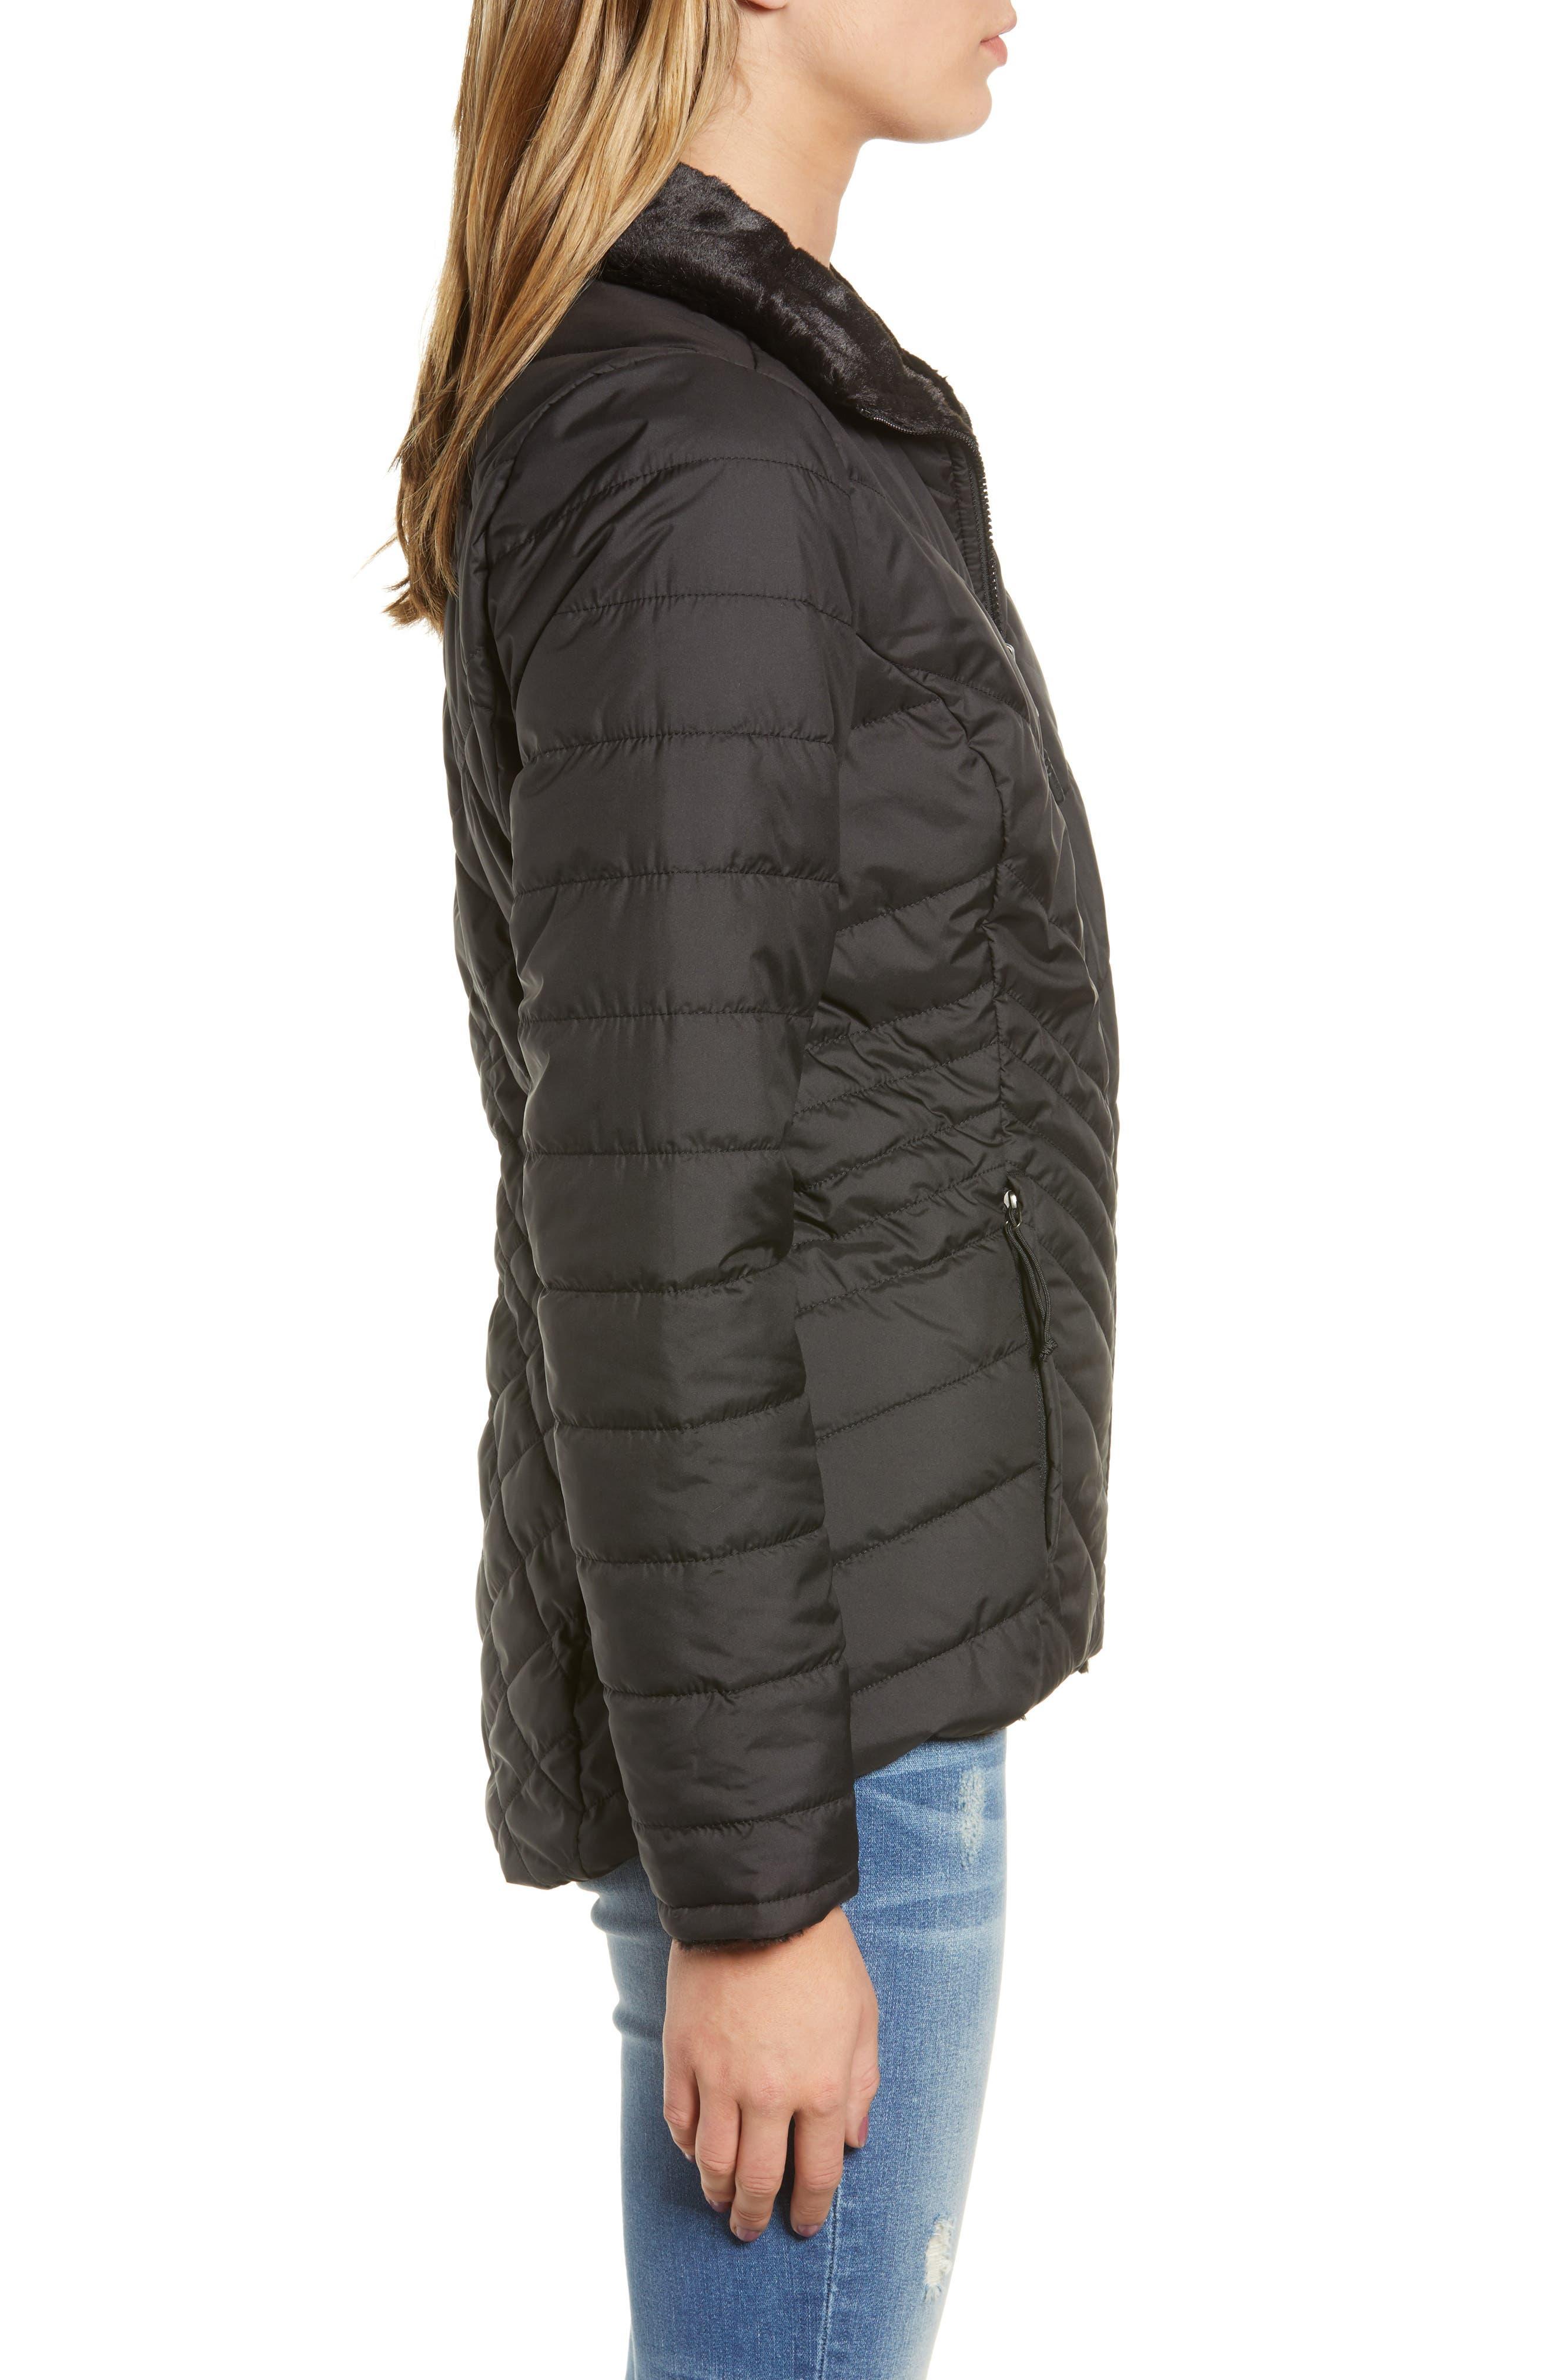 THE NORTH FACE, Mossbud Reversible Heatseeker<sup>™</sup> Wind Resistant Jacket, Alternate thumbnail 4, color, TNF BLACK